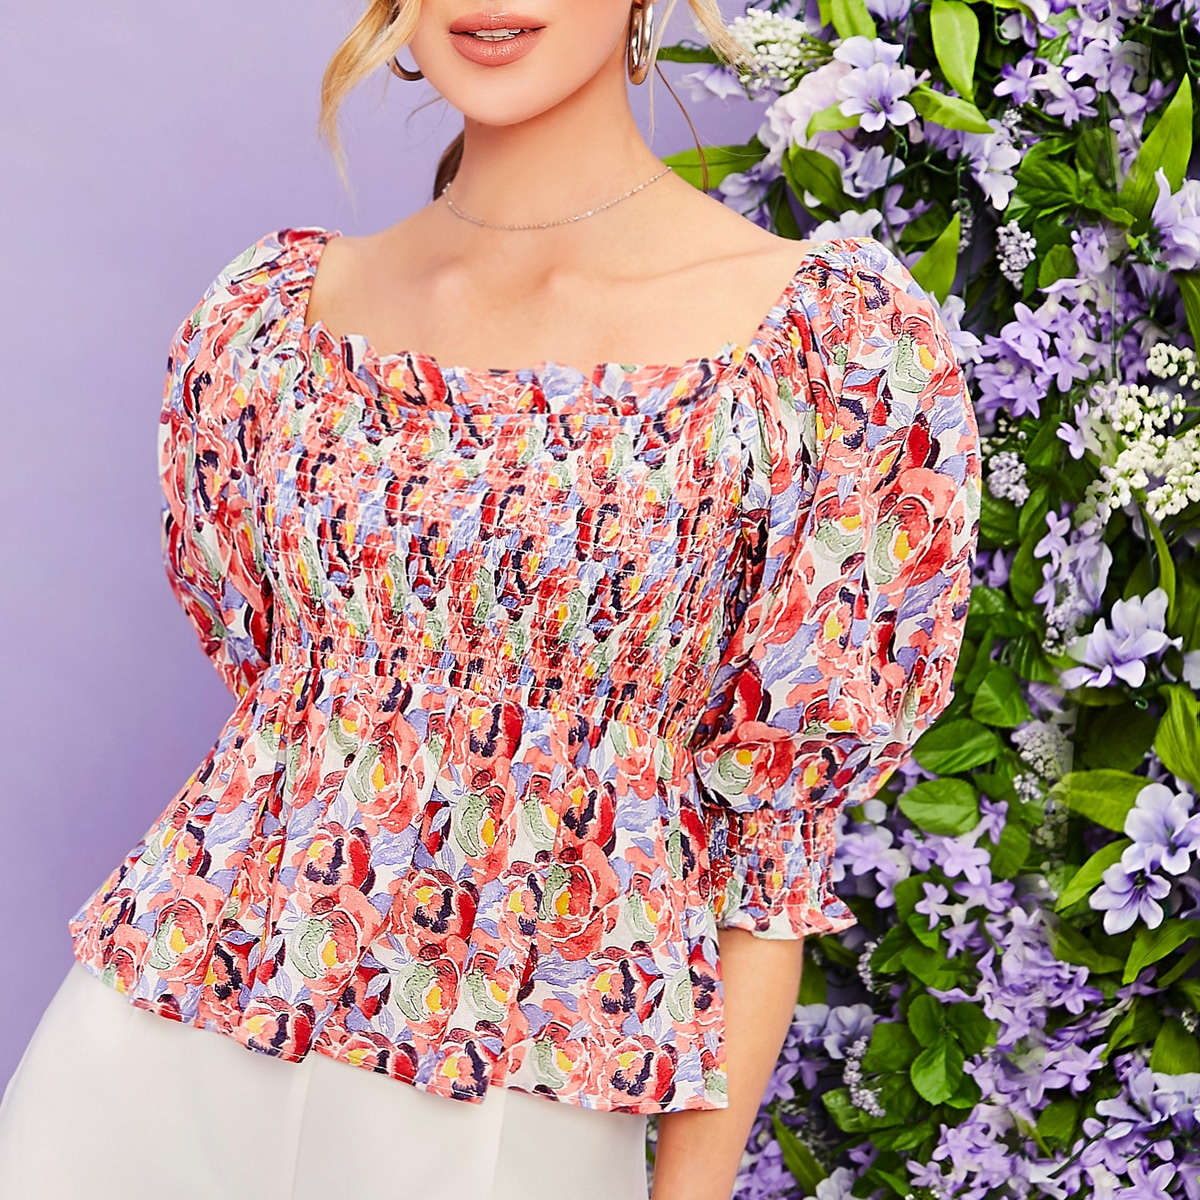 SHEIN / Square Neck Ruffle Trim Floral Print Shirred Peplum Top